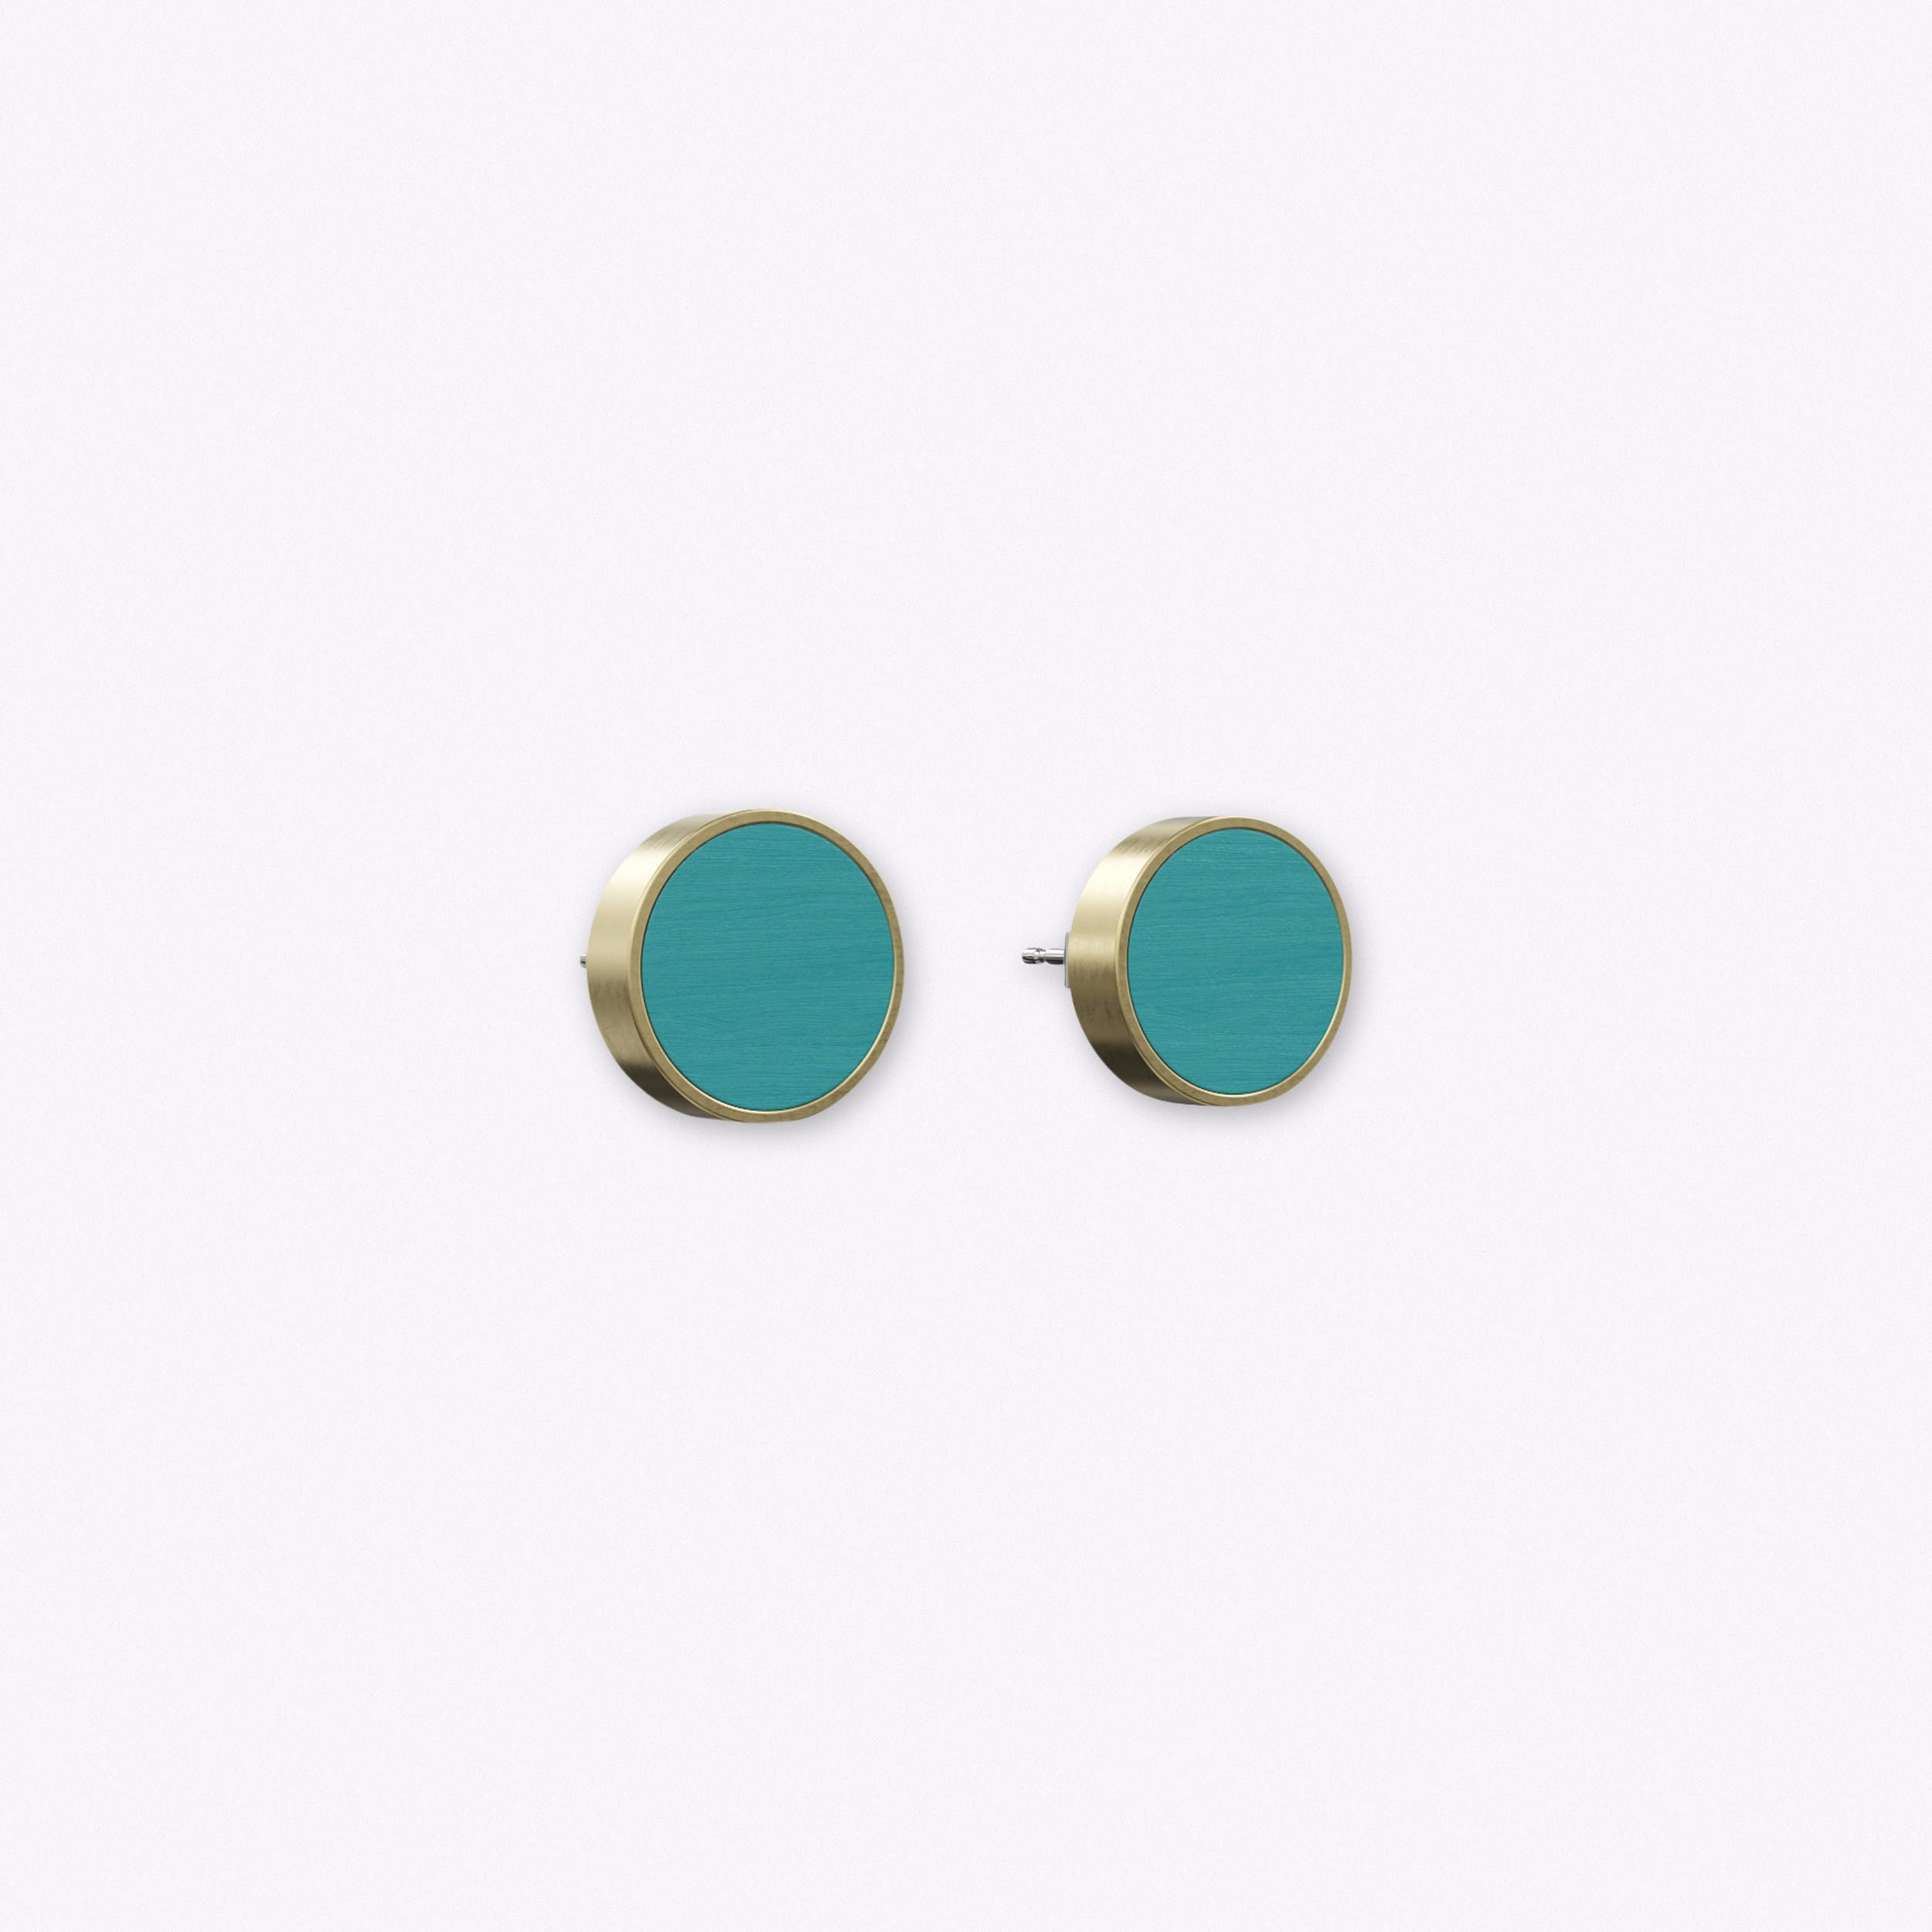 Determinative Earrings in Turquoise